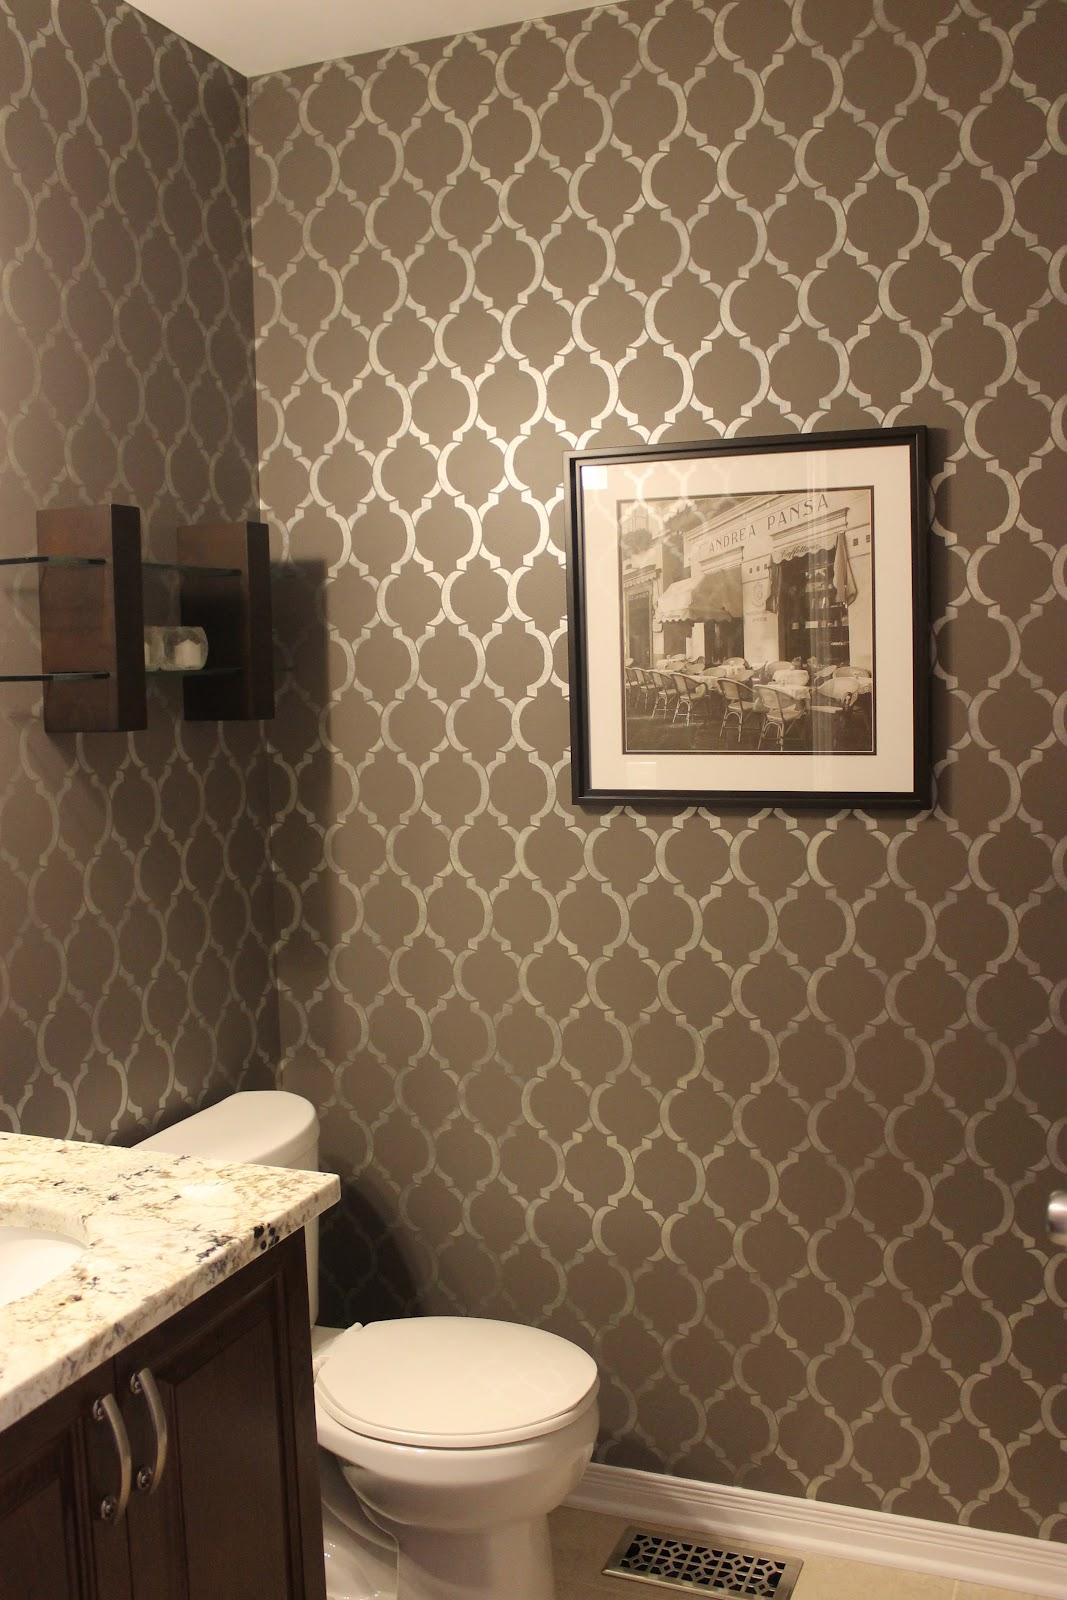 Km decor powder room reveal - Powder room wallpaper ideas ...